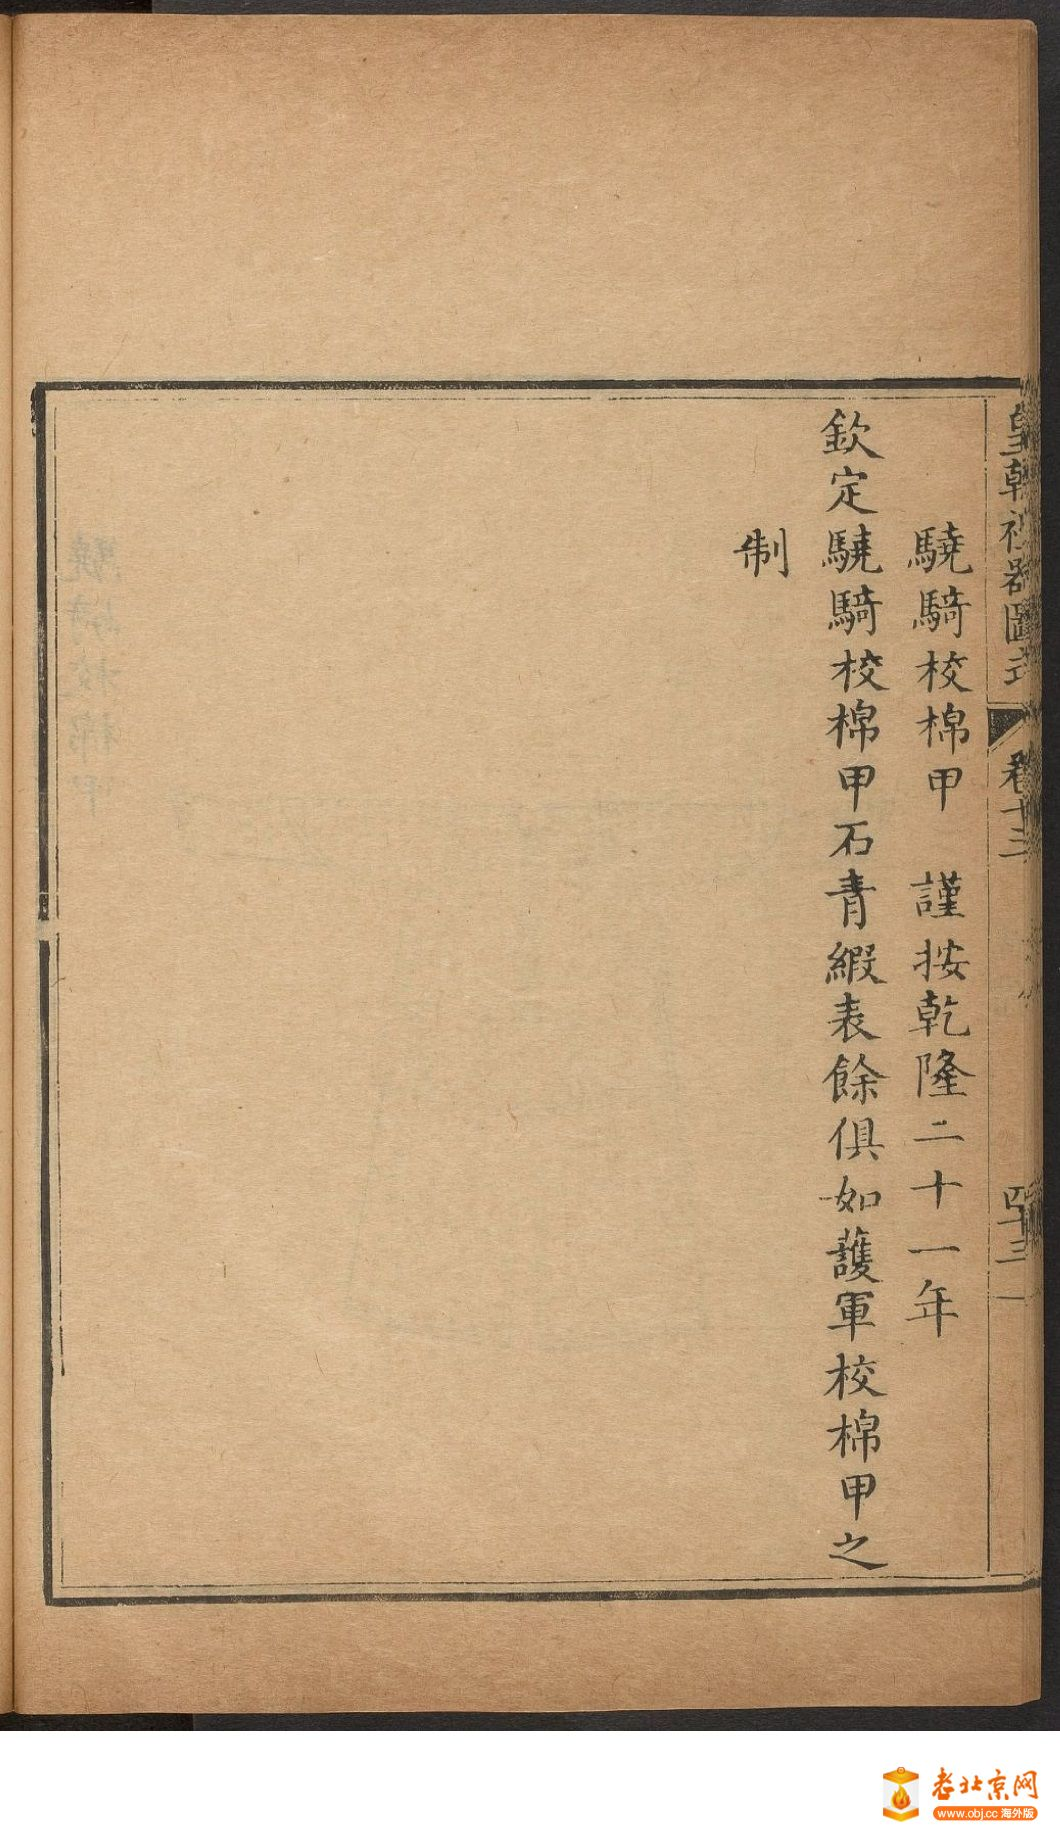 5_page4_image1b.jpg